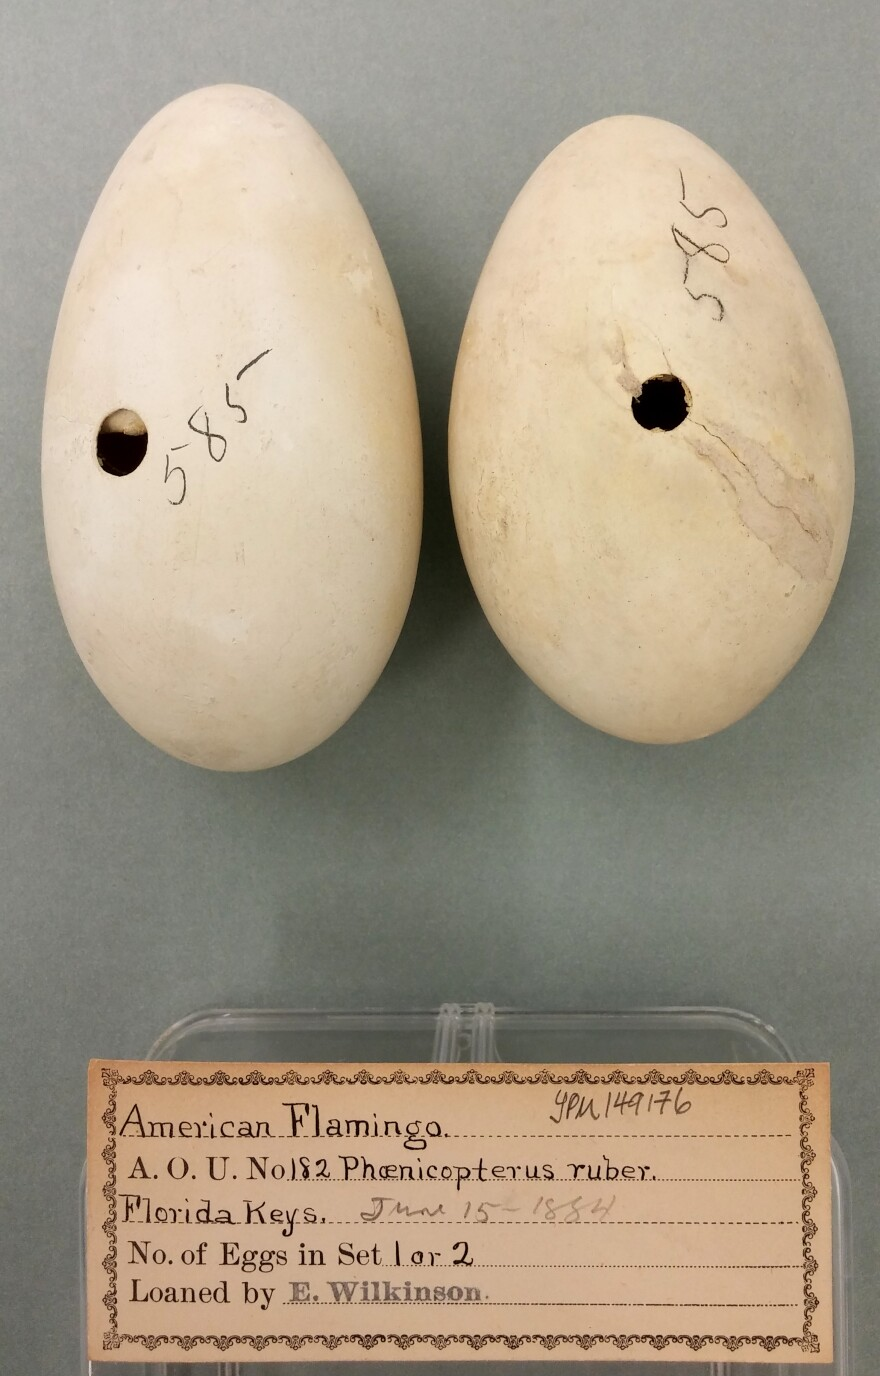 flamingo_eggs_yale_peabody_museum.jpg